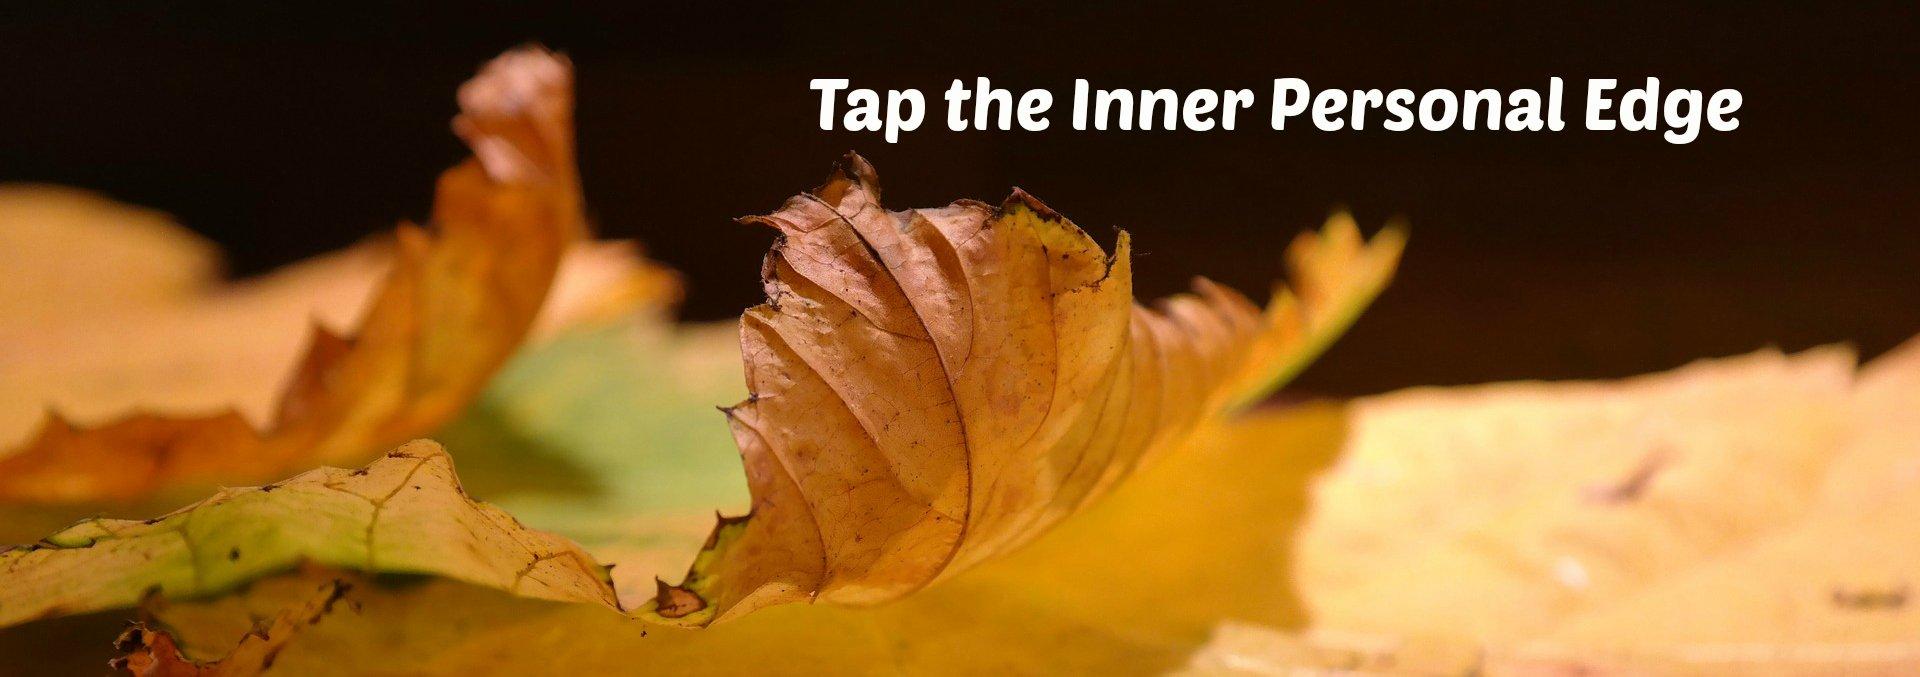 Edge of fall tree leaf, illustrating the theme,